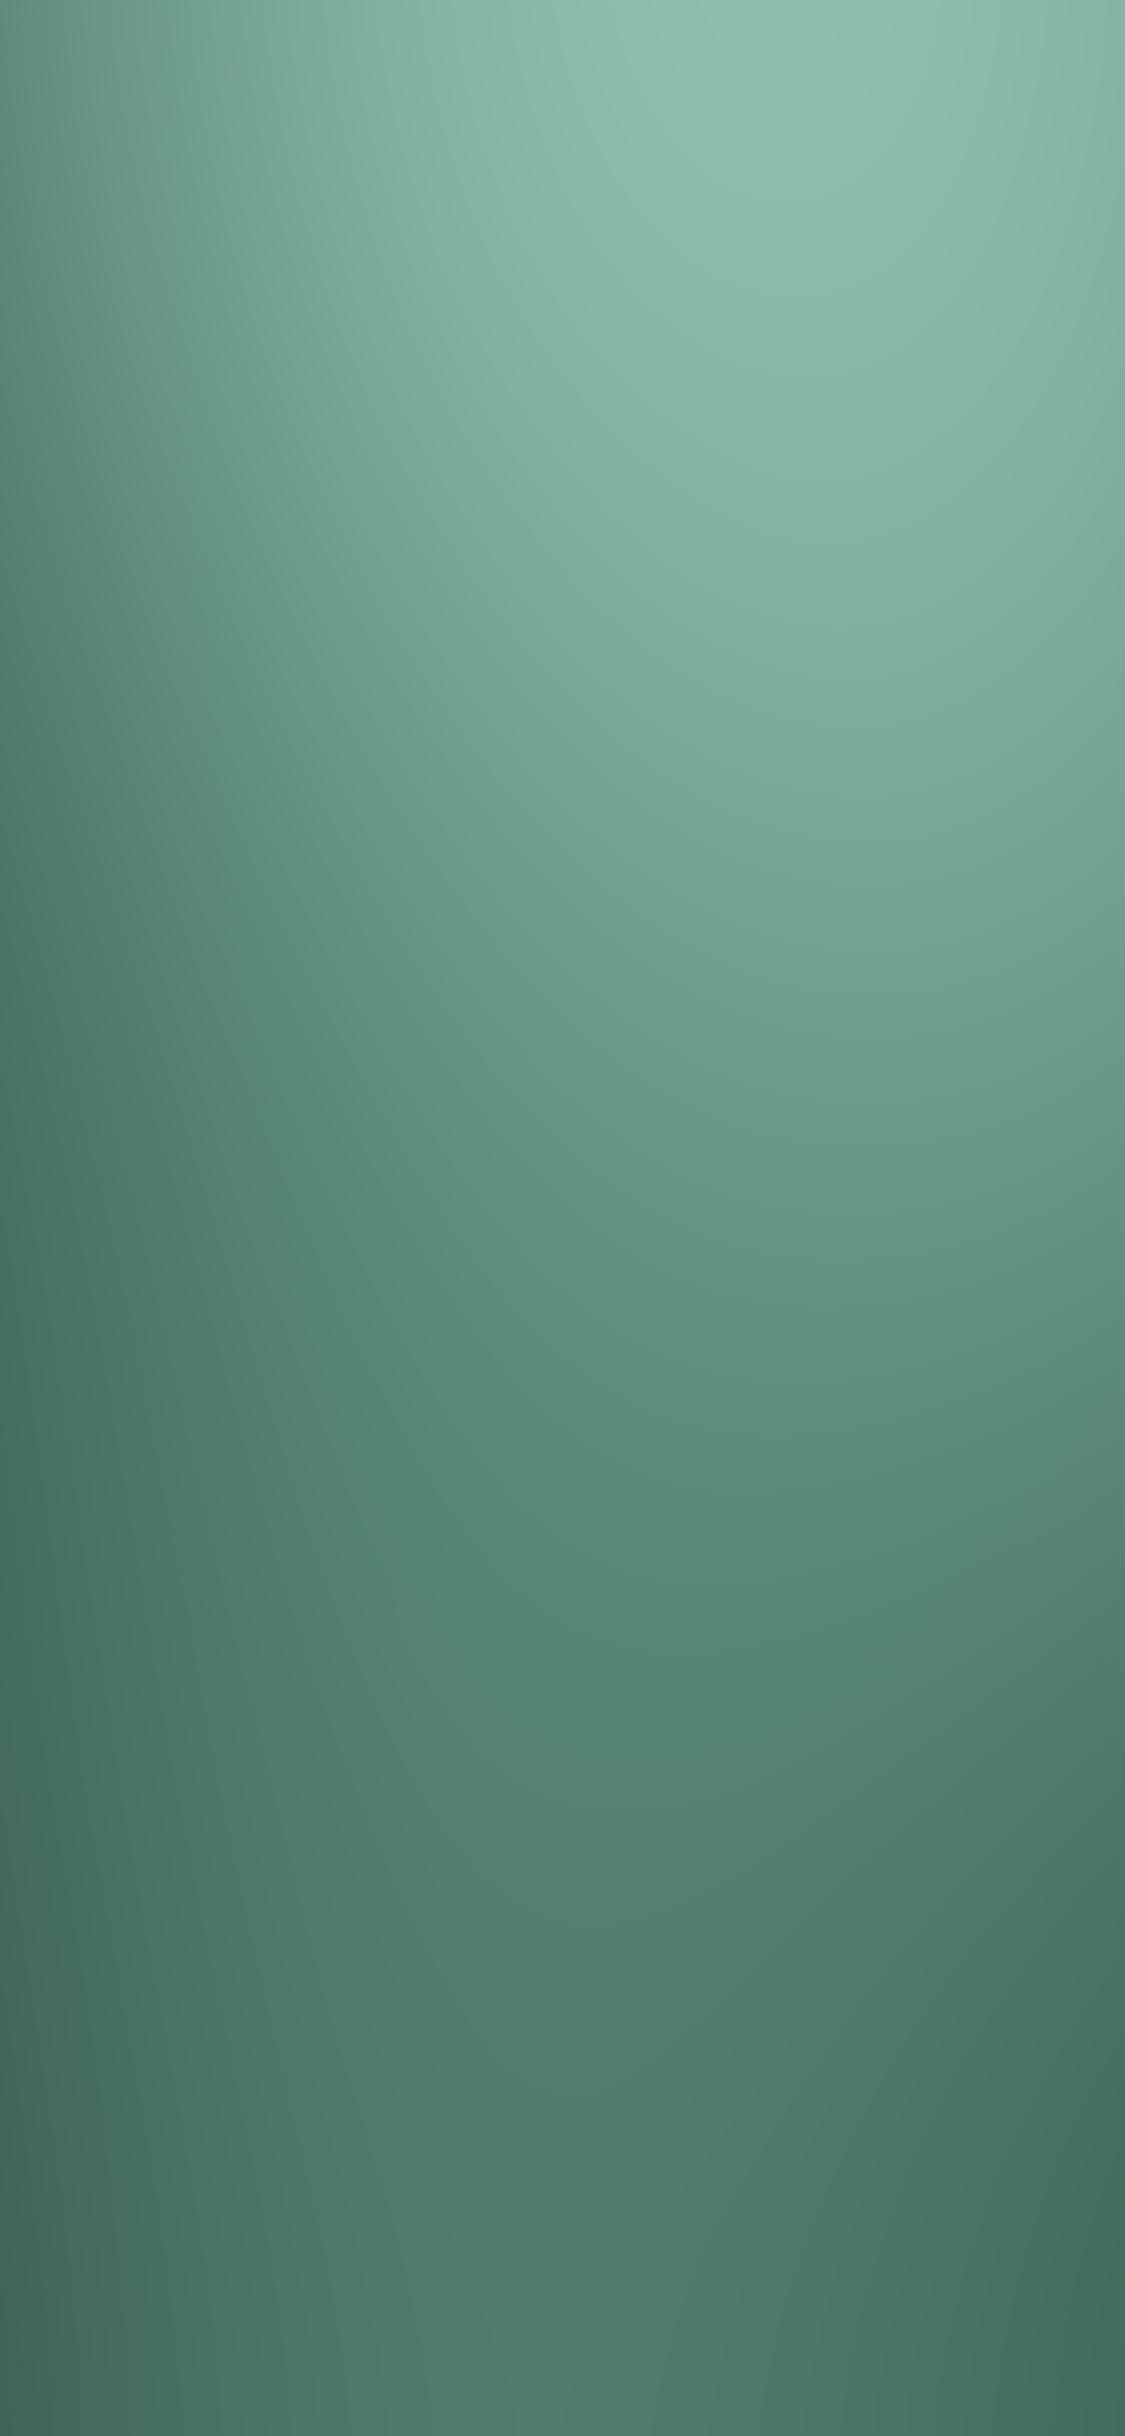 iPhoneXpapers.com-Apple-iPhone-wallpaper-sf90-green-solid-gradation-blur